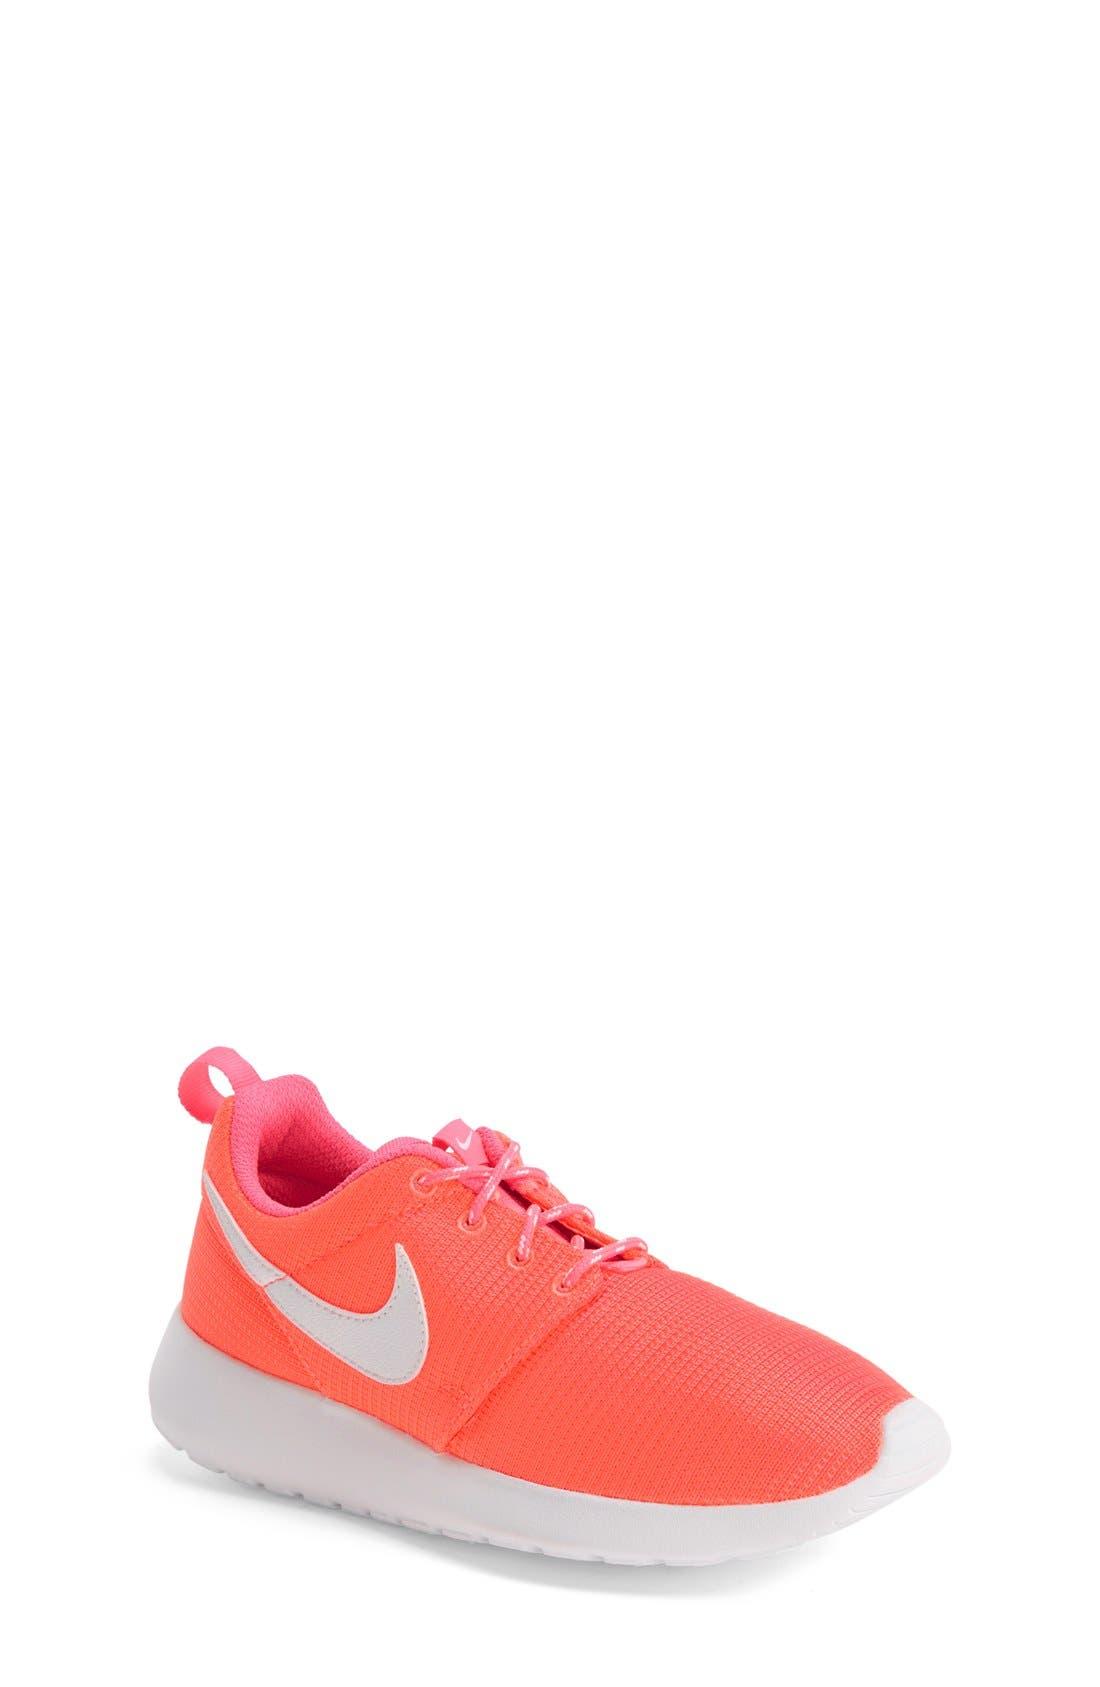 'Roshe Run' Athletic Shoe,                             Main thumbnail 53, color,